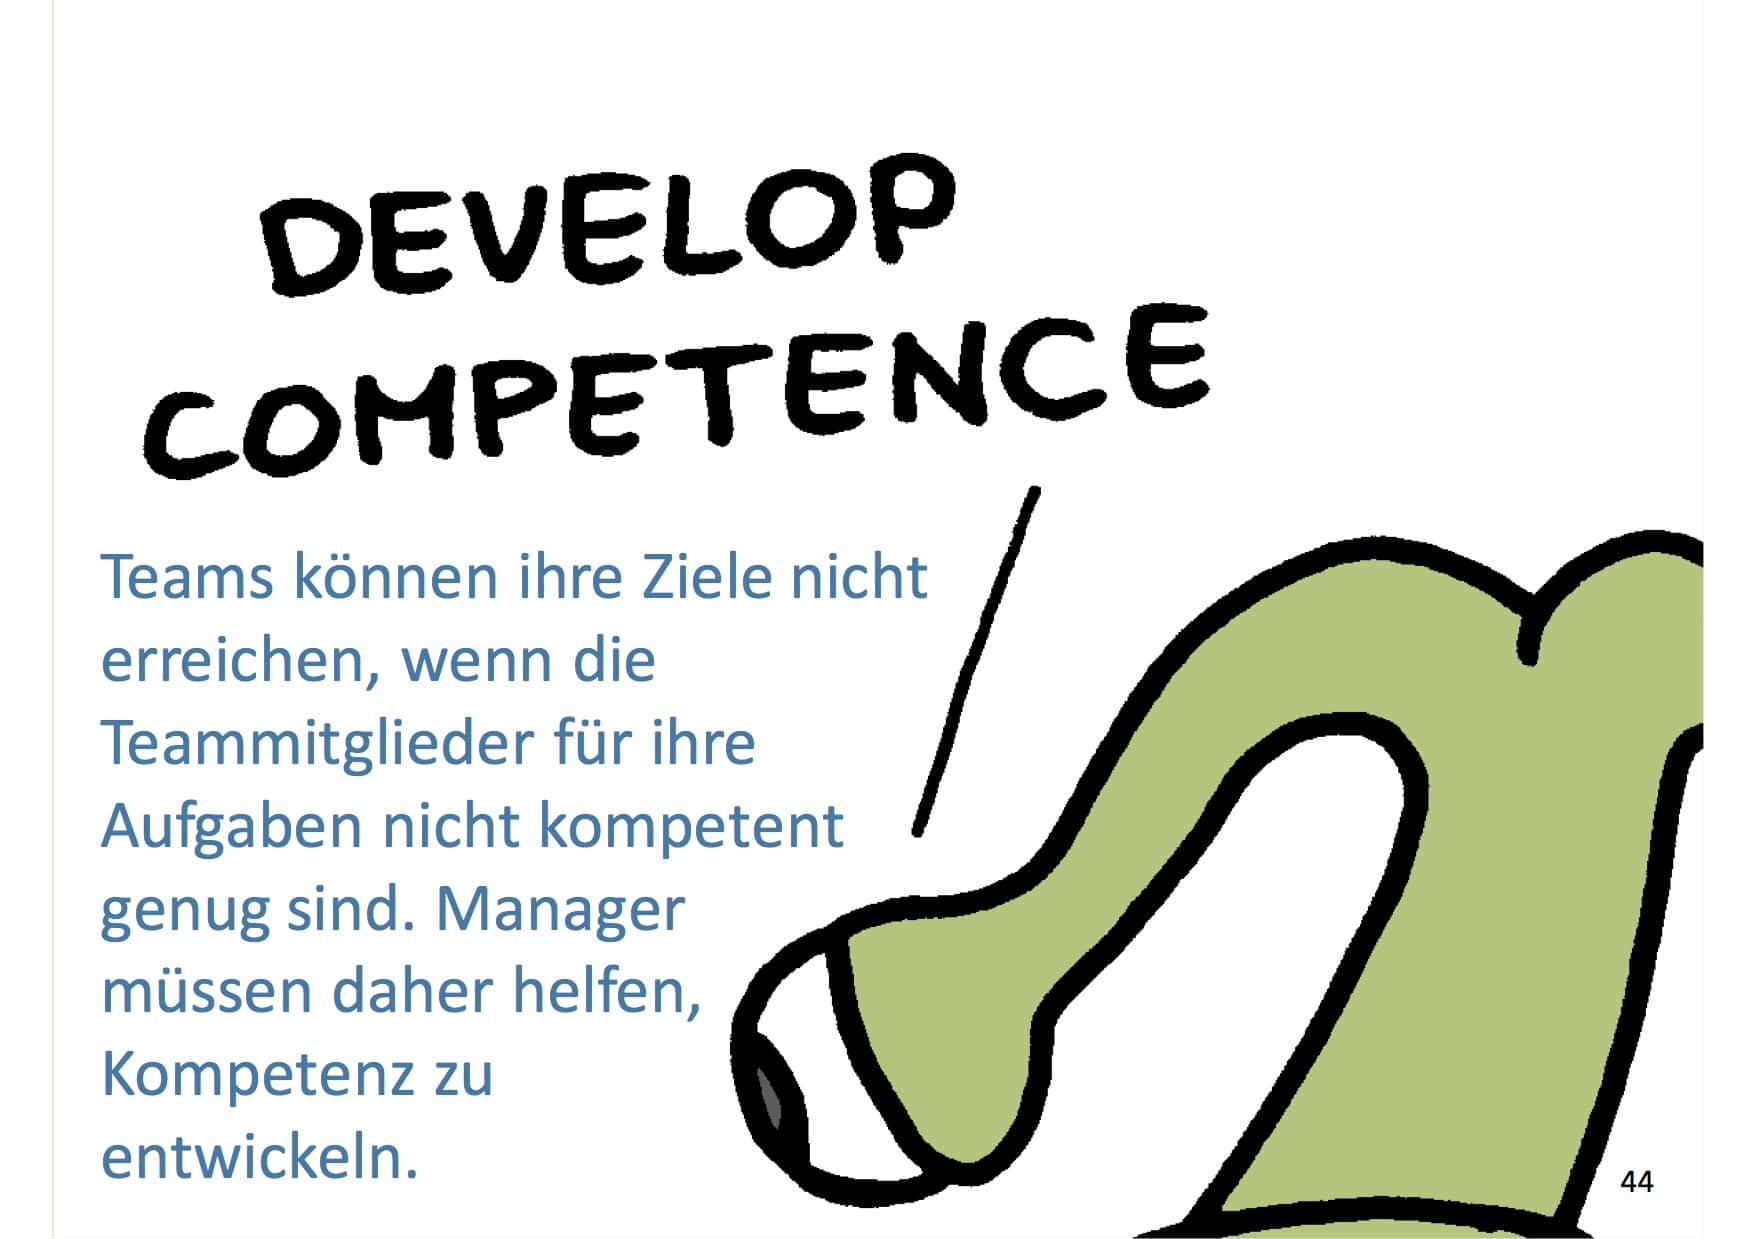 Management 3.0 Develop Competence